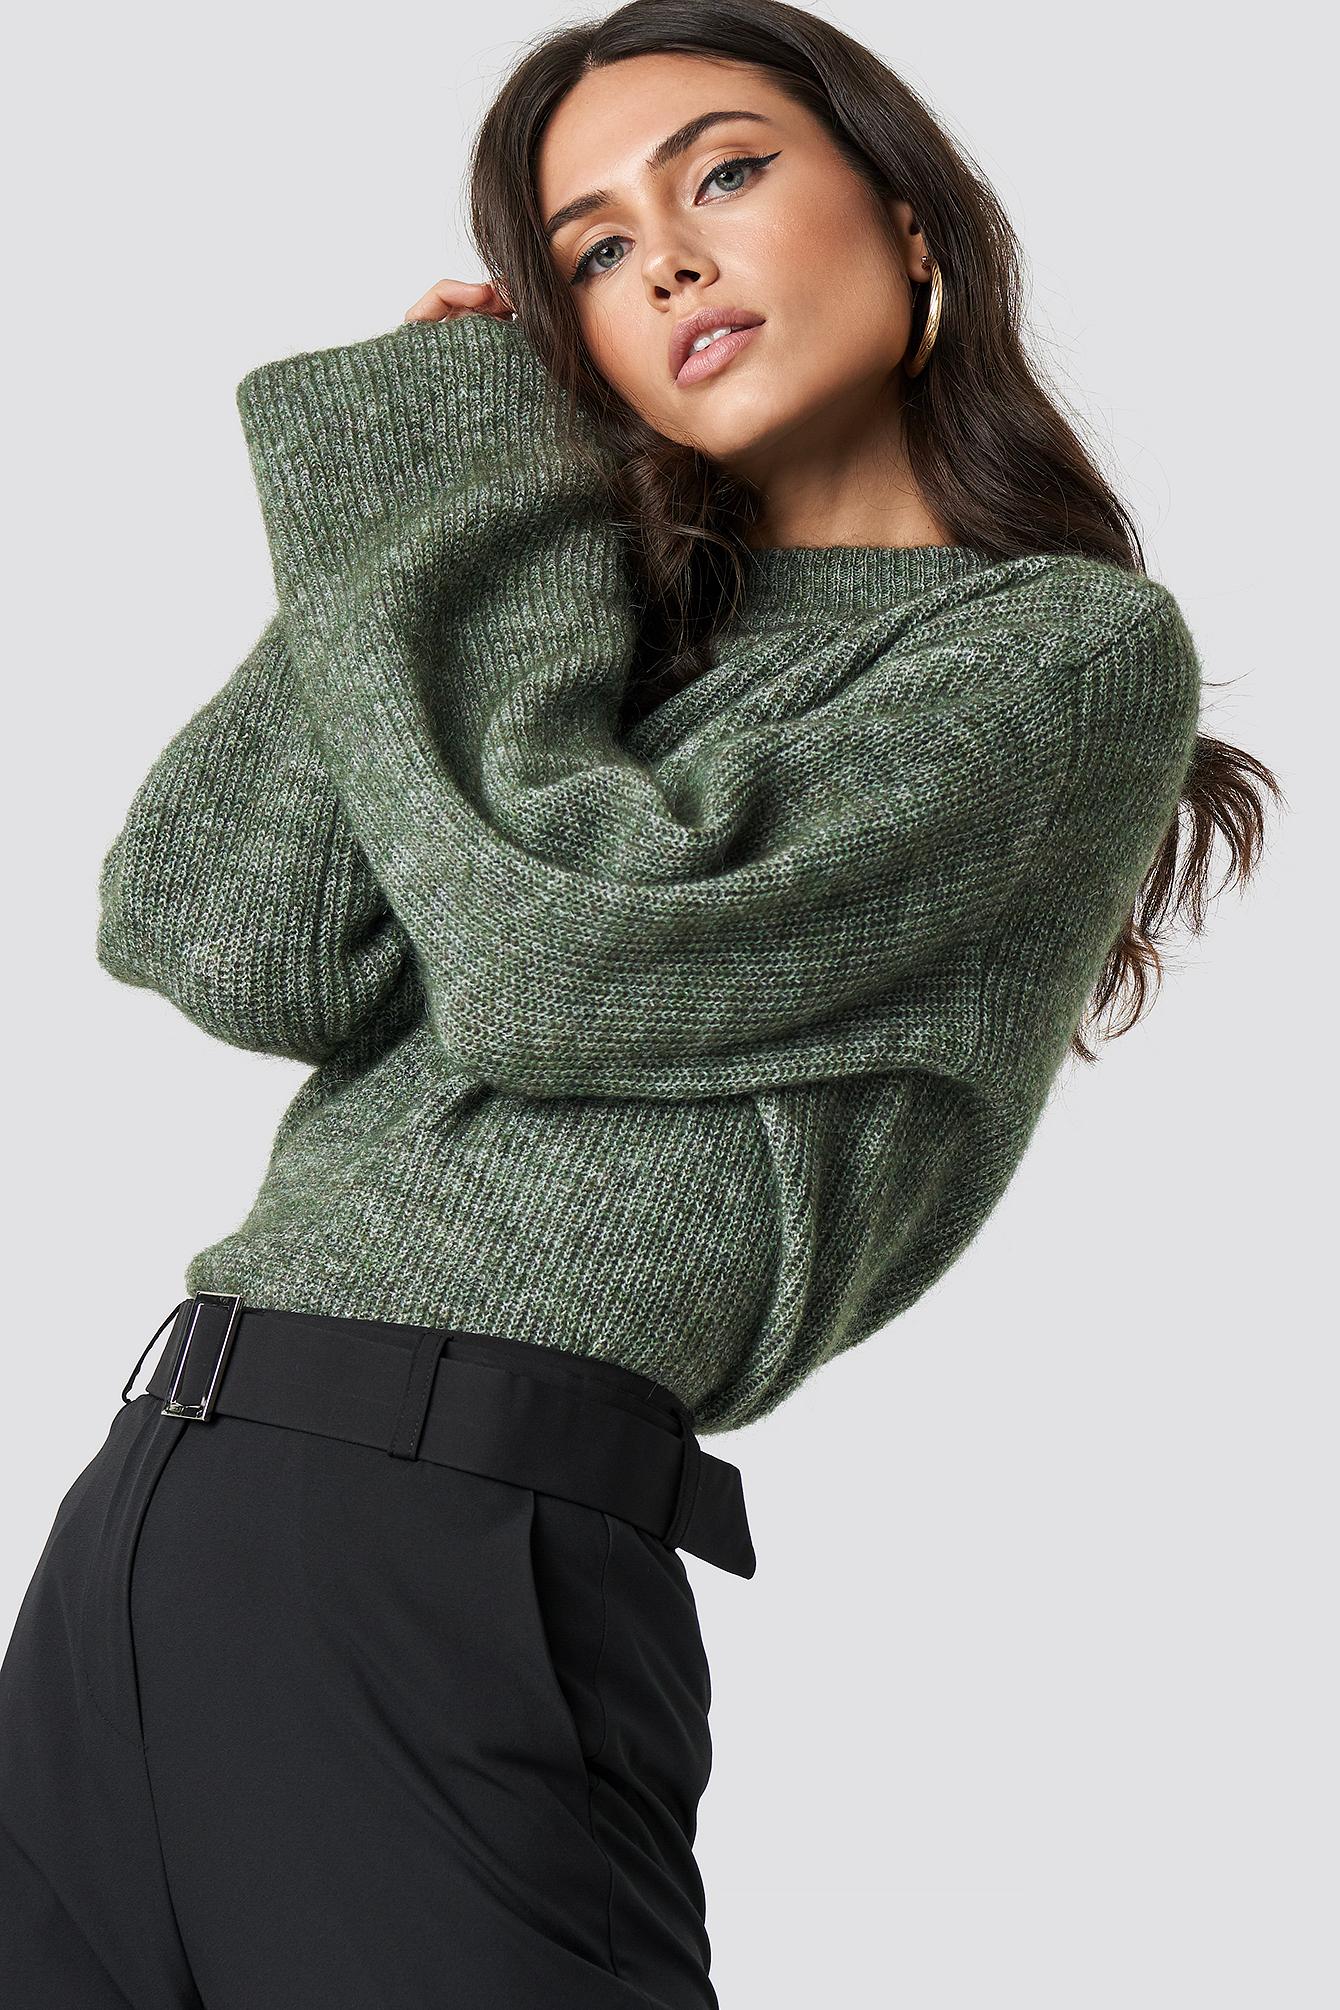 Blend Wide Sleeve GreenNa Wool Sweater Yb7fgv6y